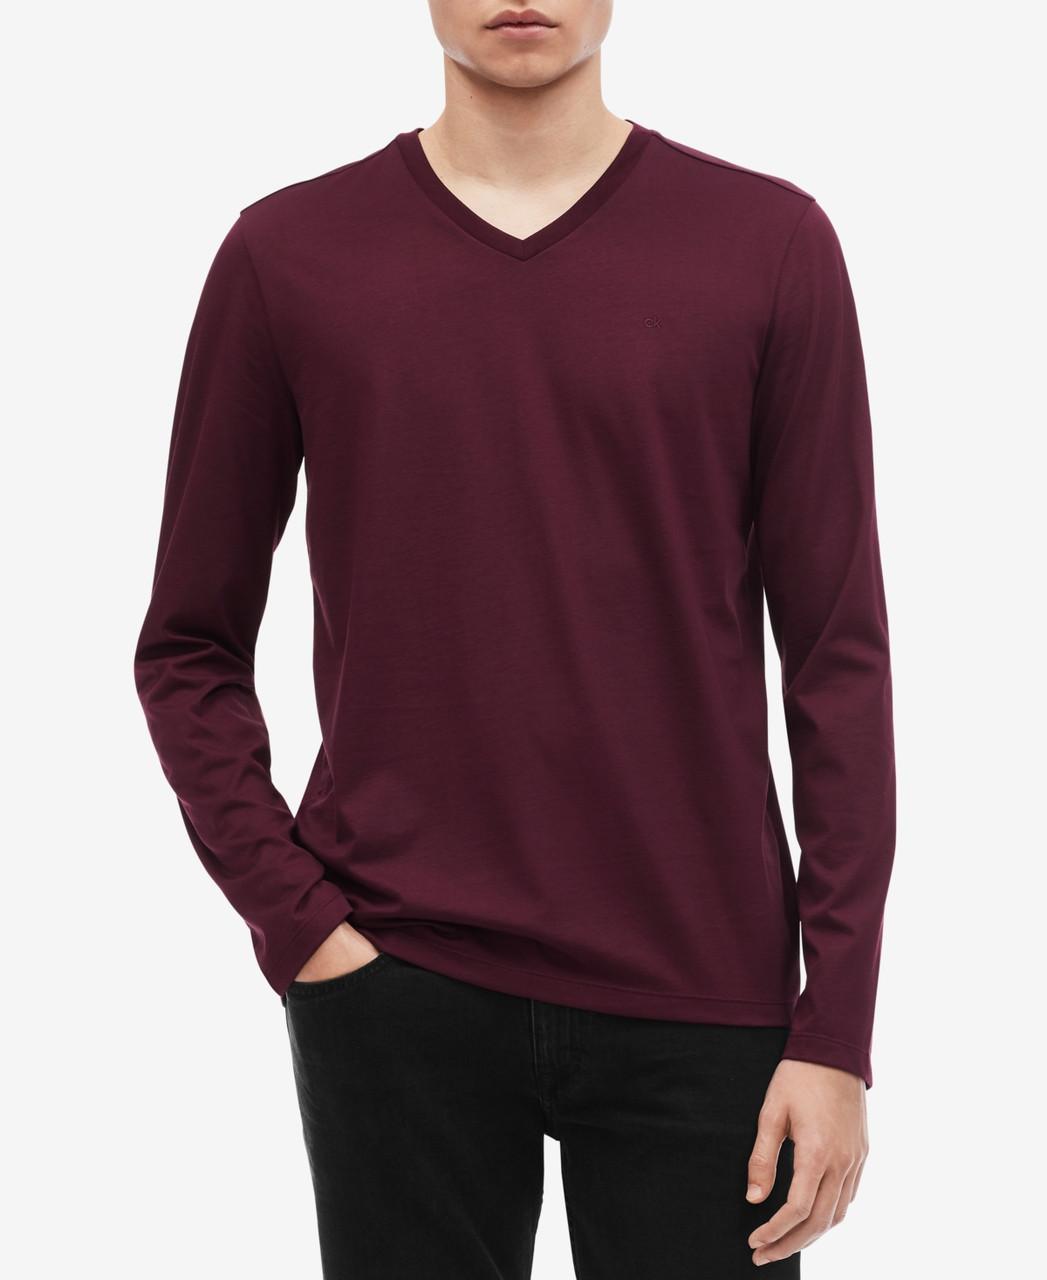 Calvin Klein   Мужской свитер -  А4